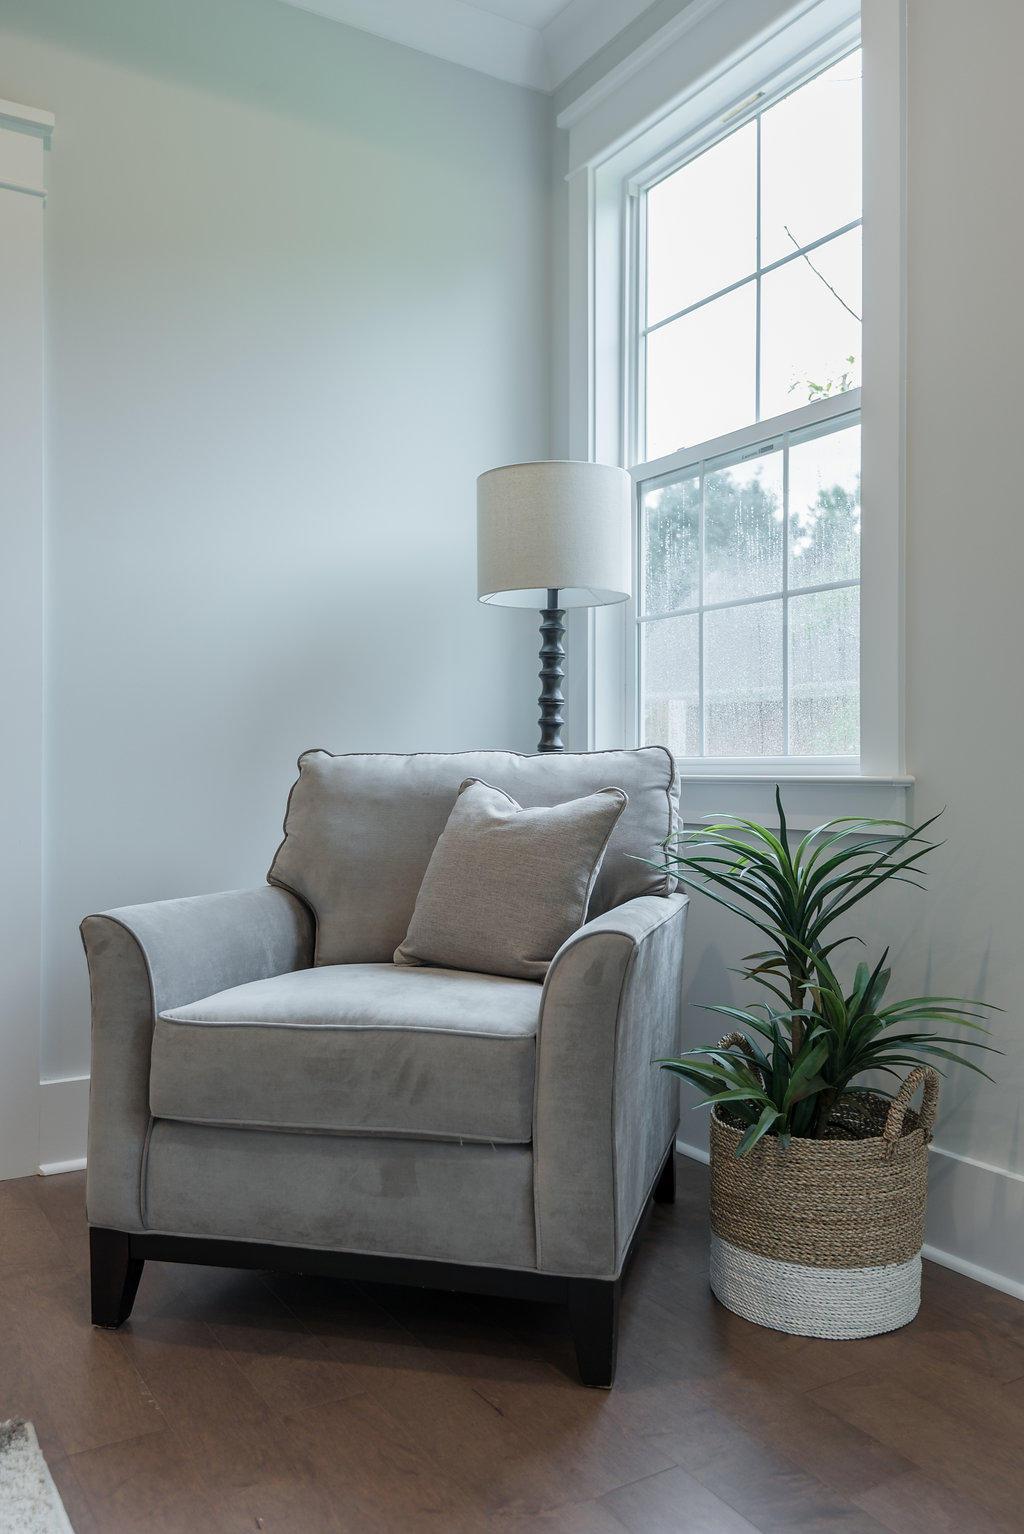 Park West Homes For Sale - 7 Brightwood, Mount Pleasant, SC - 37